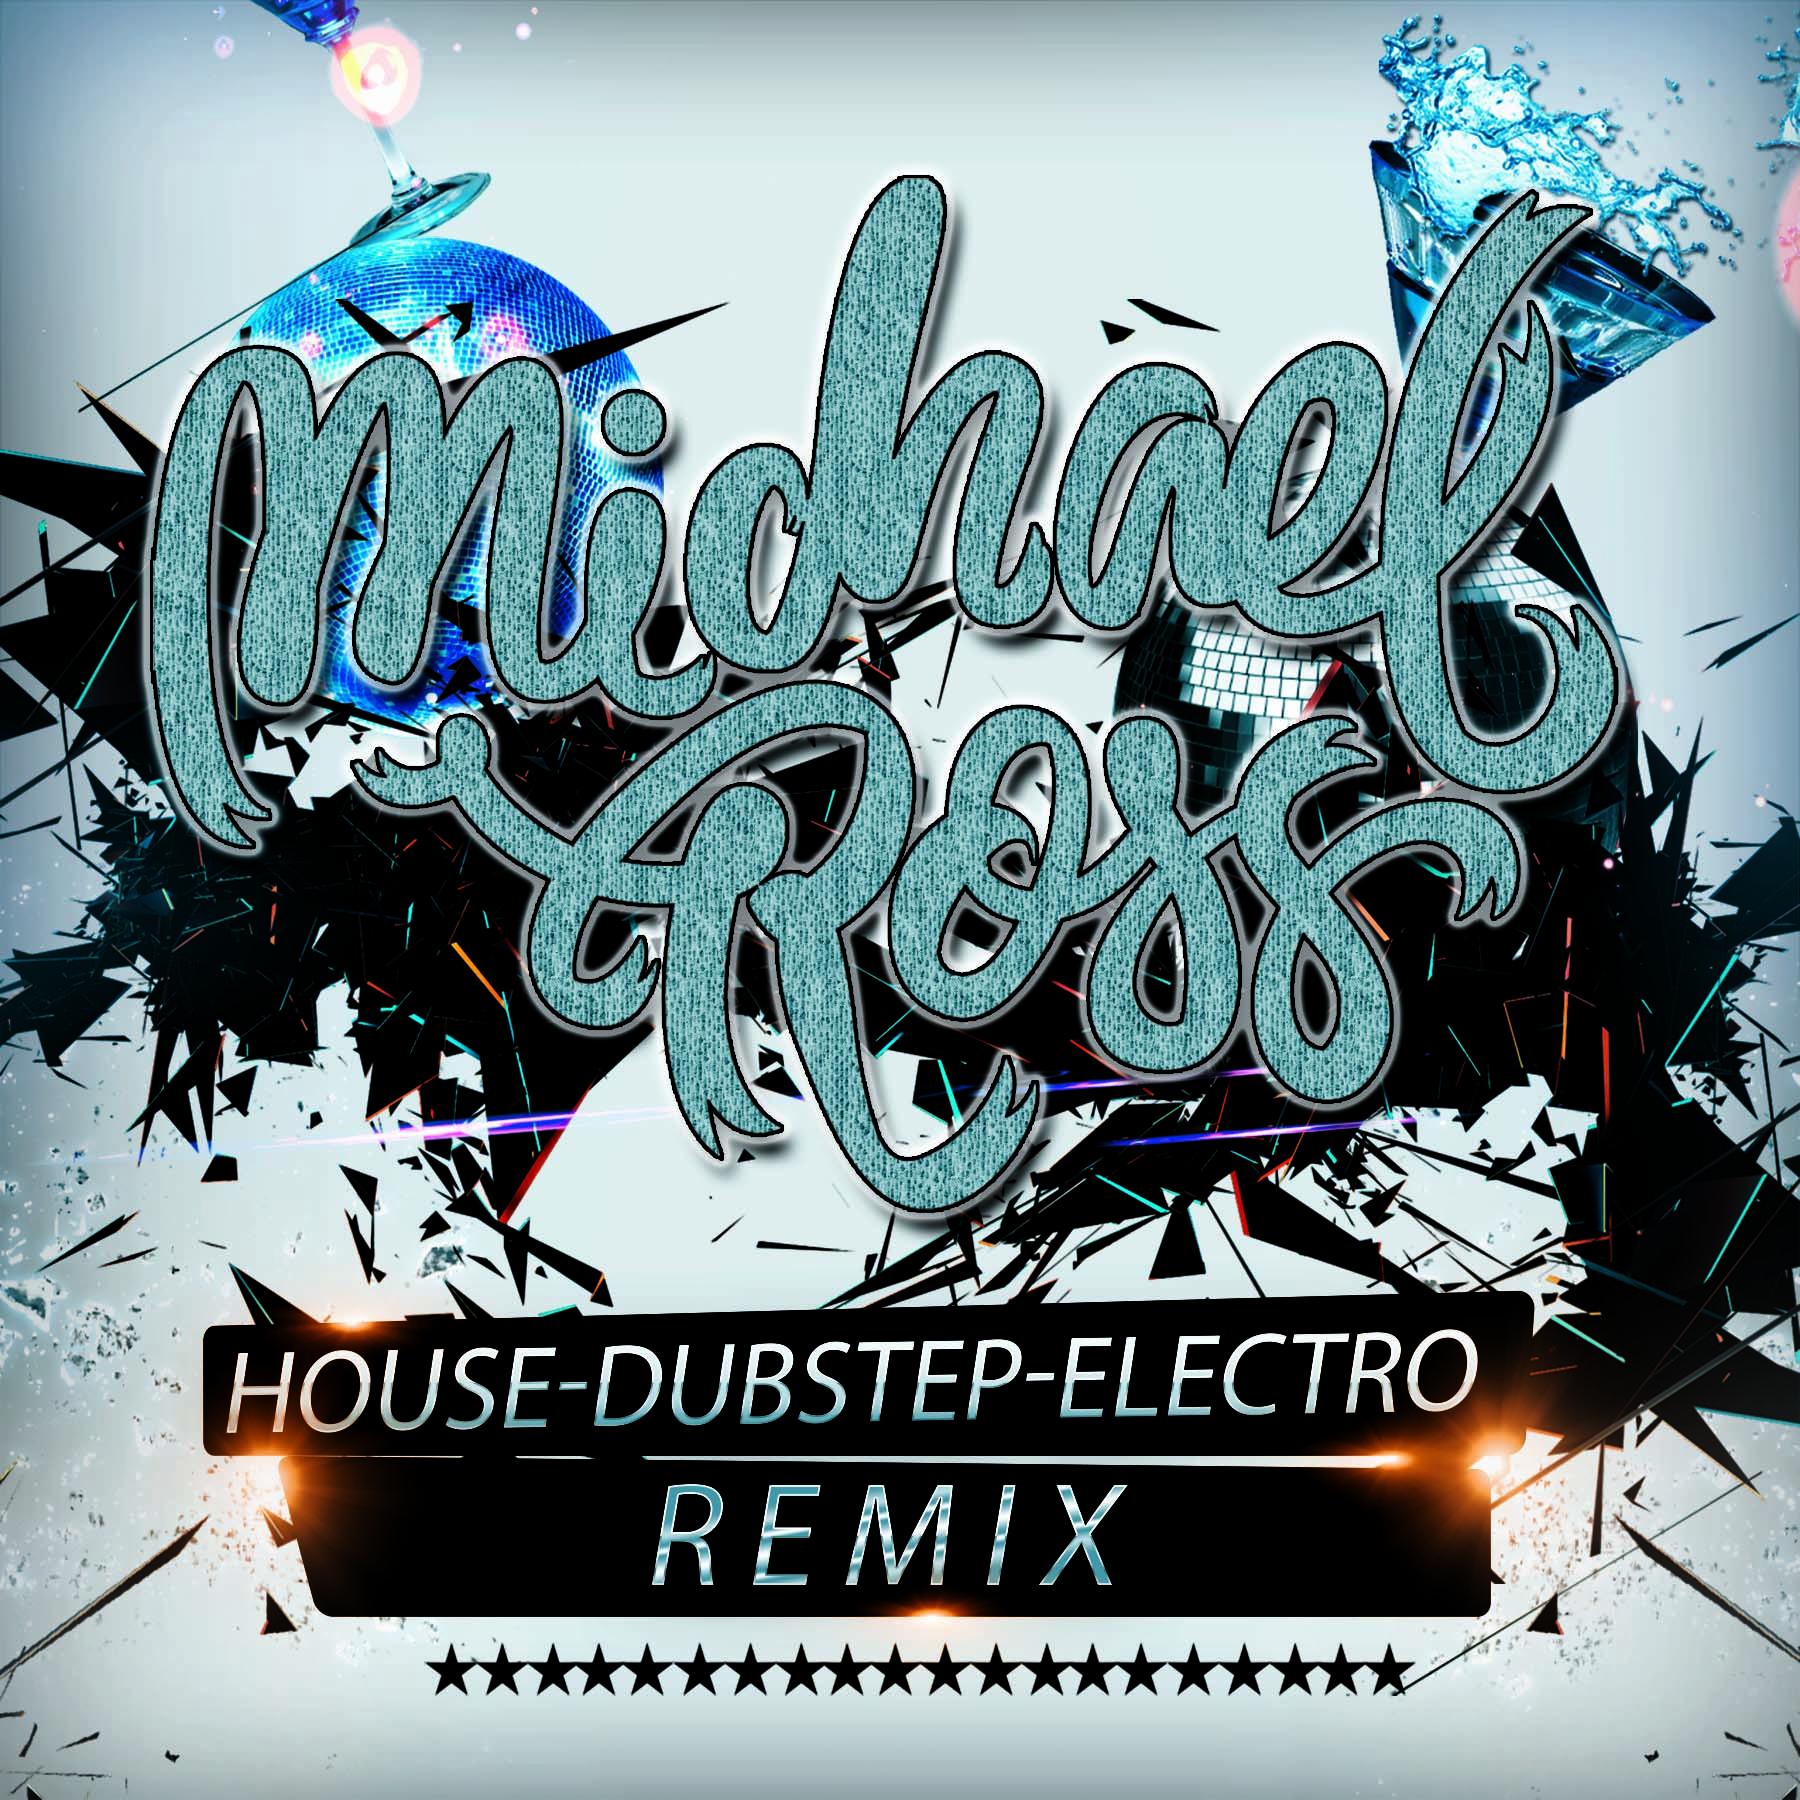 Caratula - Remix House-Dubstep-Electro